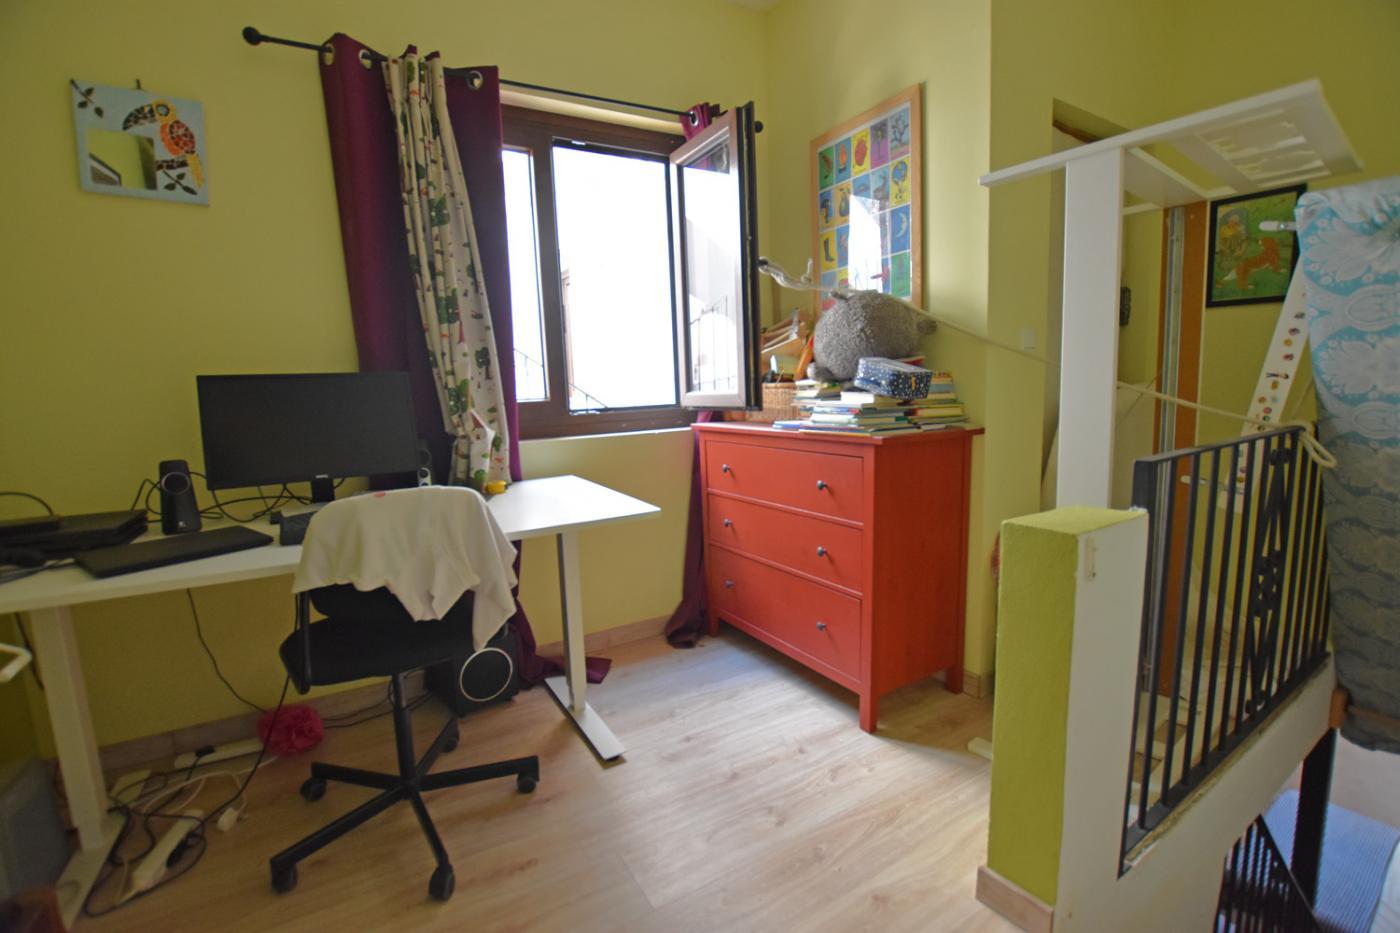 4 Bedroom Village House for Sale in Gaucin